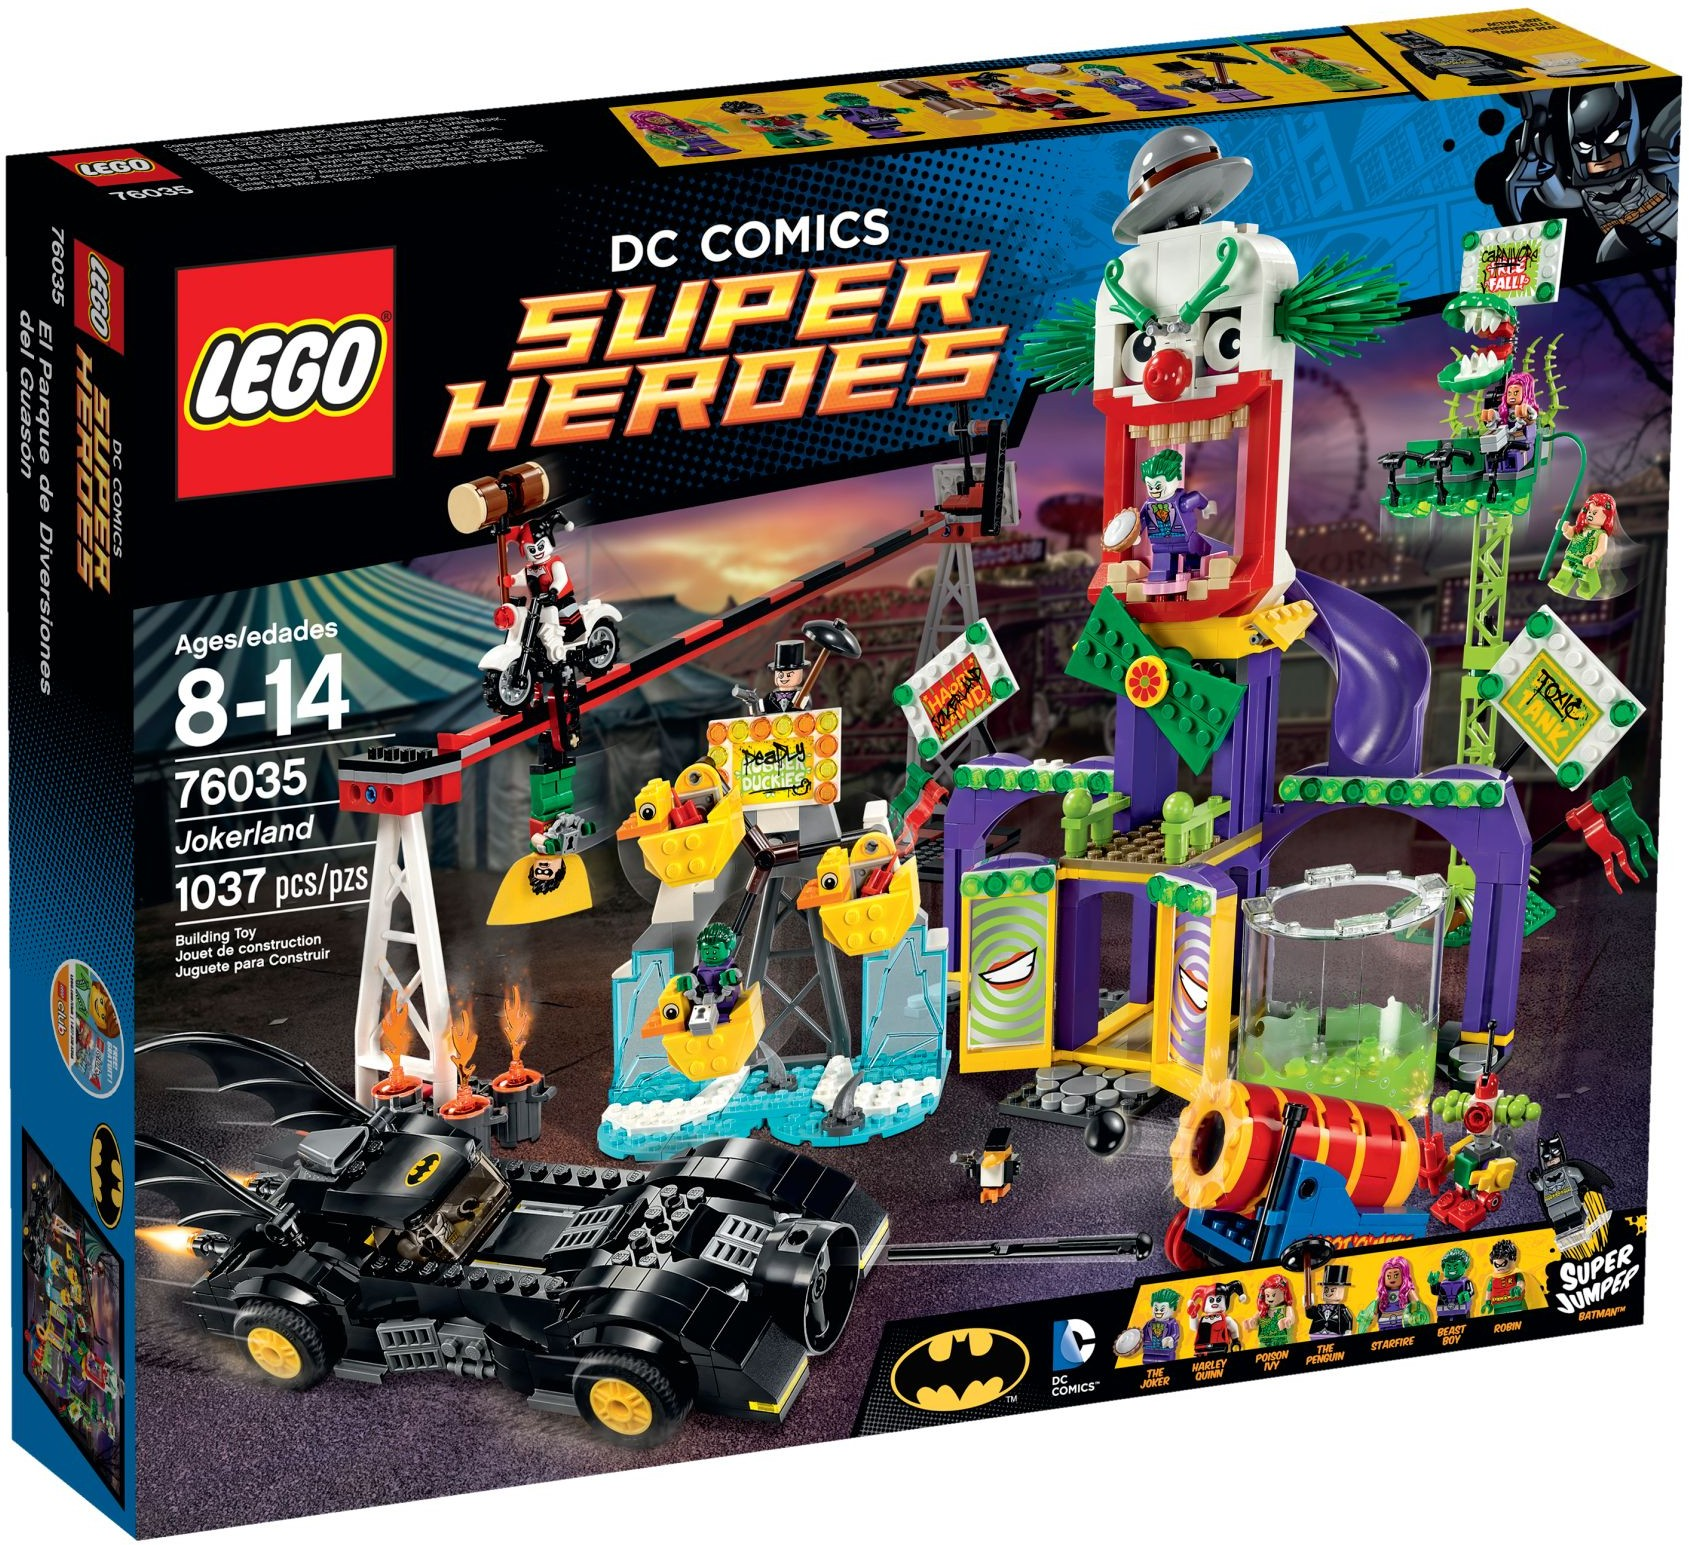 LEGO 76035 - Super Heroes - Jokerland